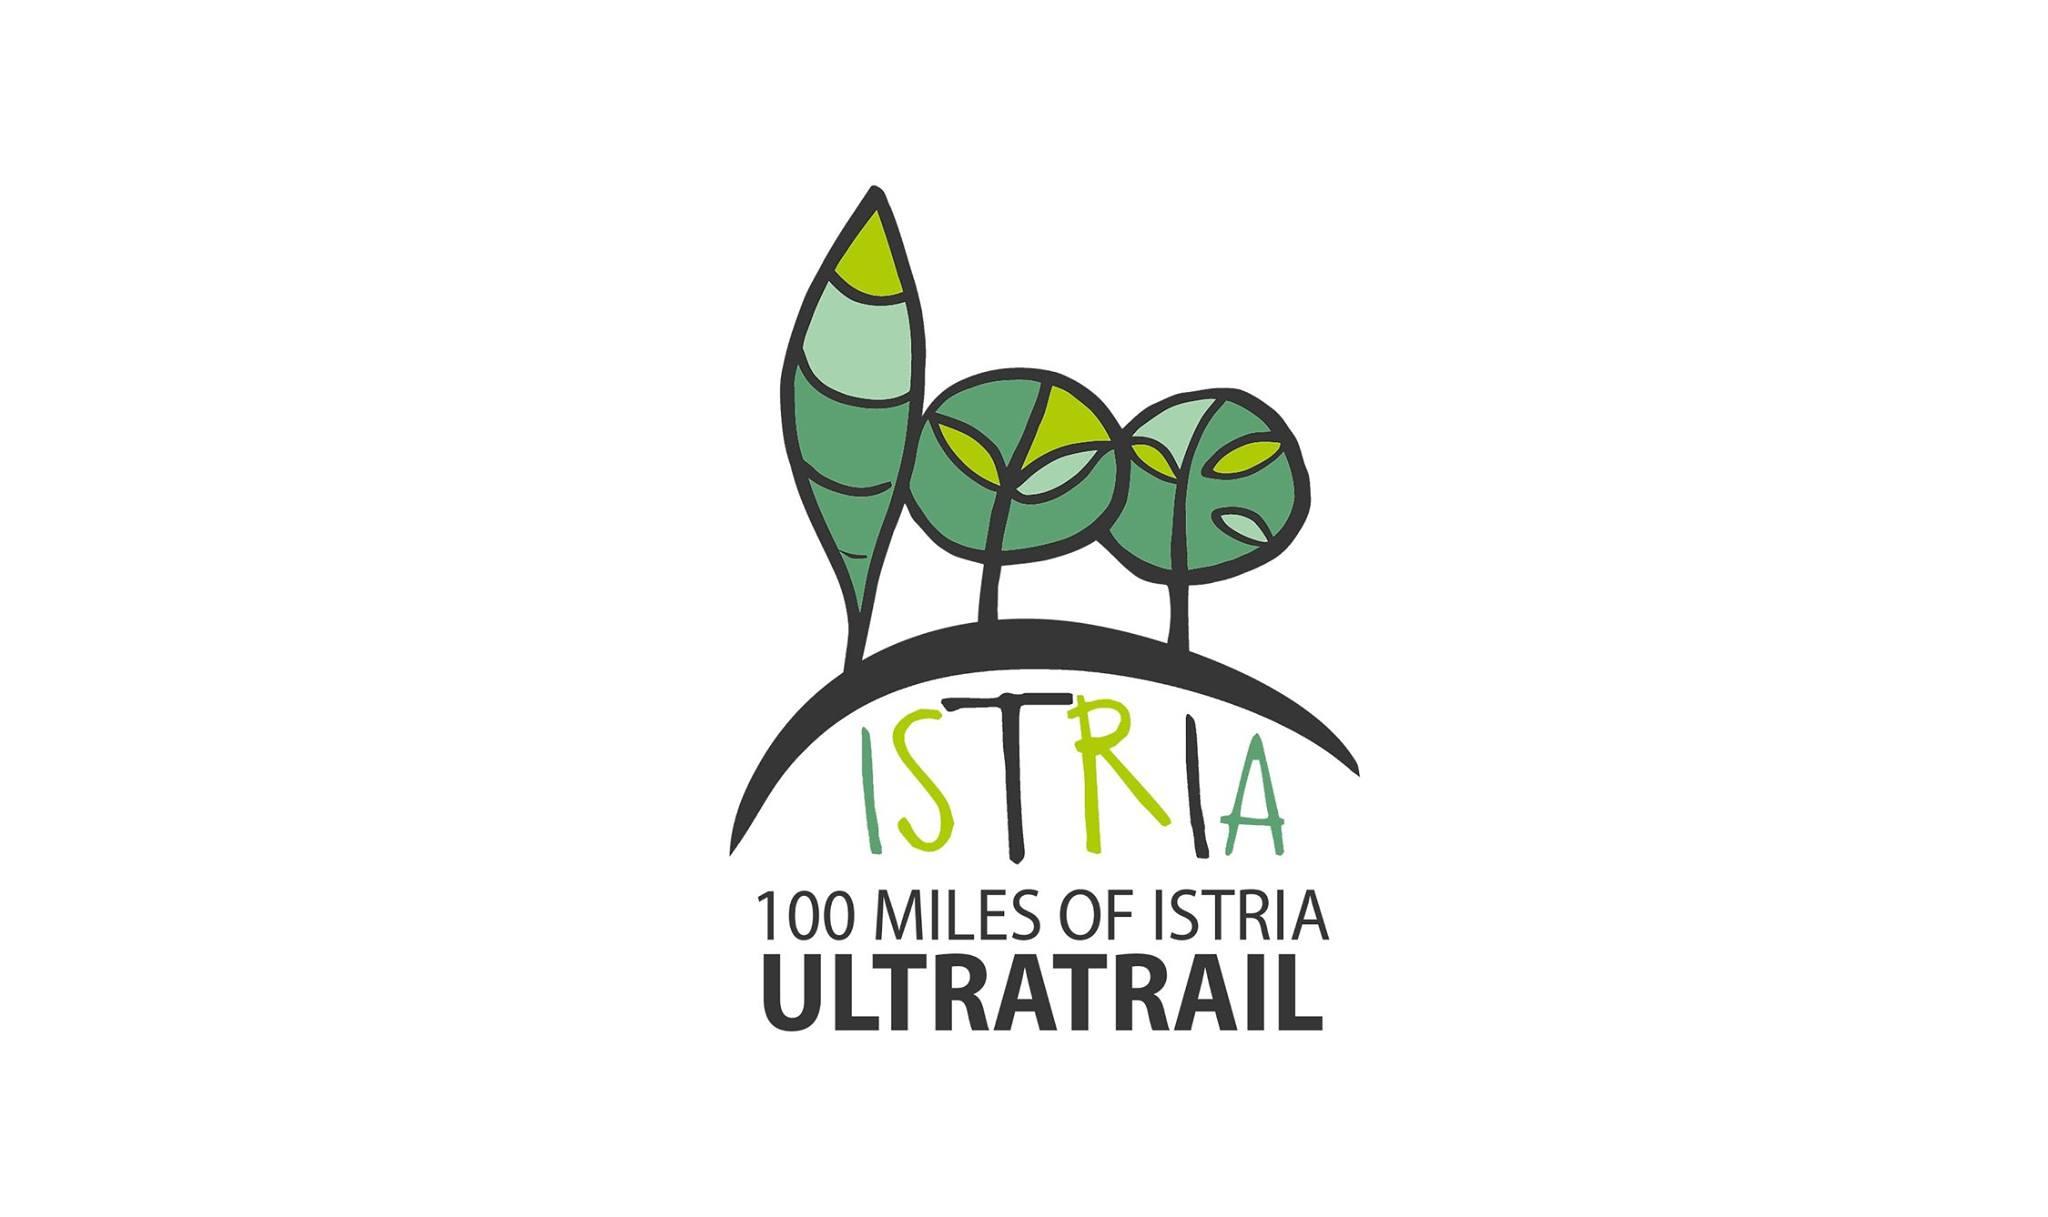 100 Miles Of Istria Ultratrail, zdroj: istria100.com